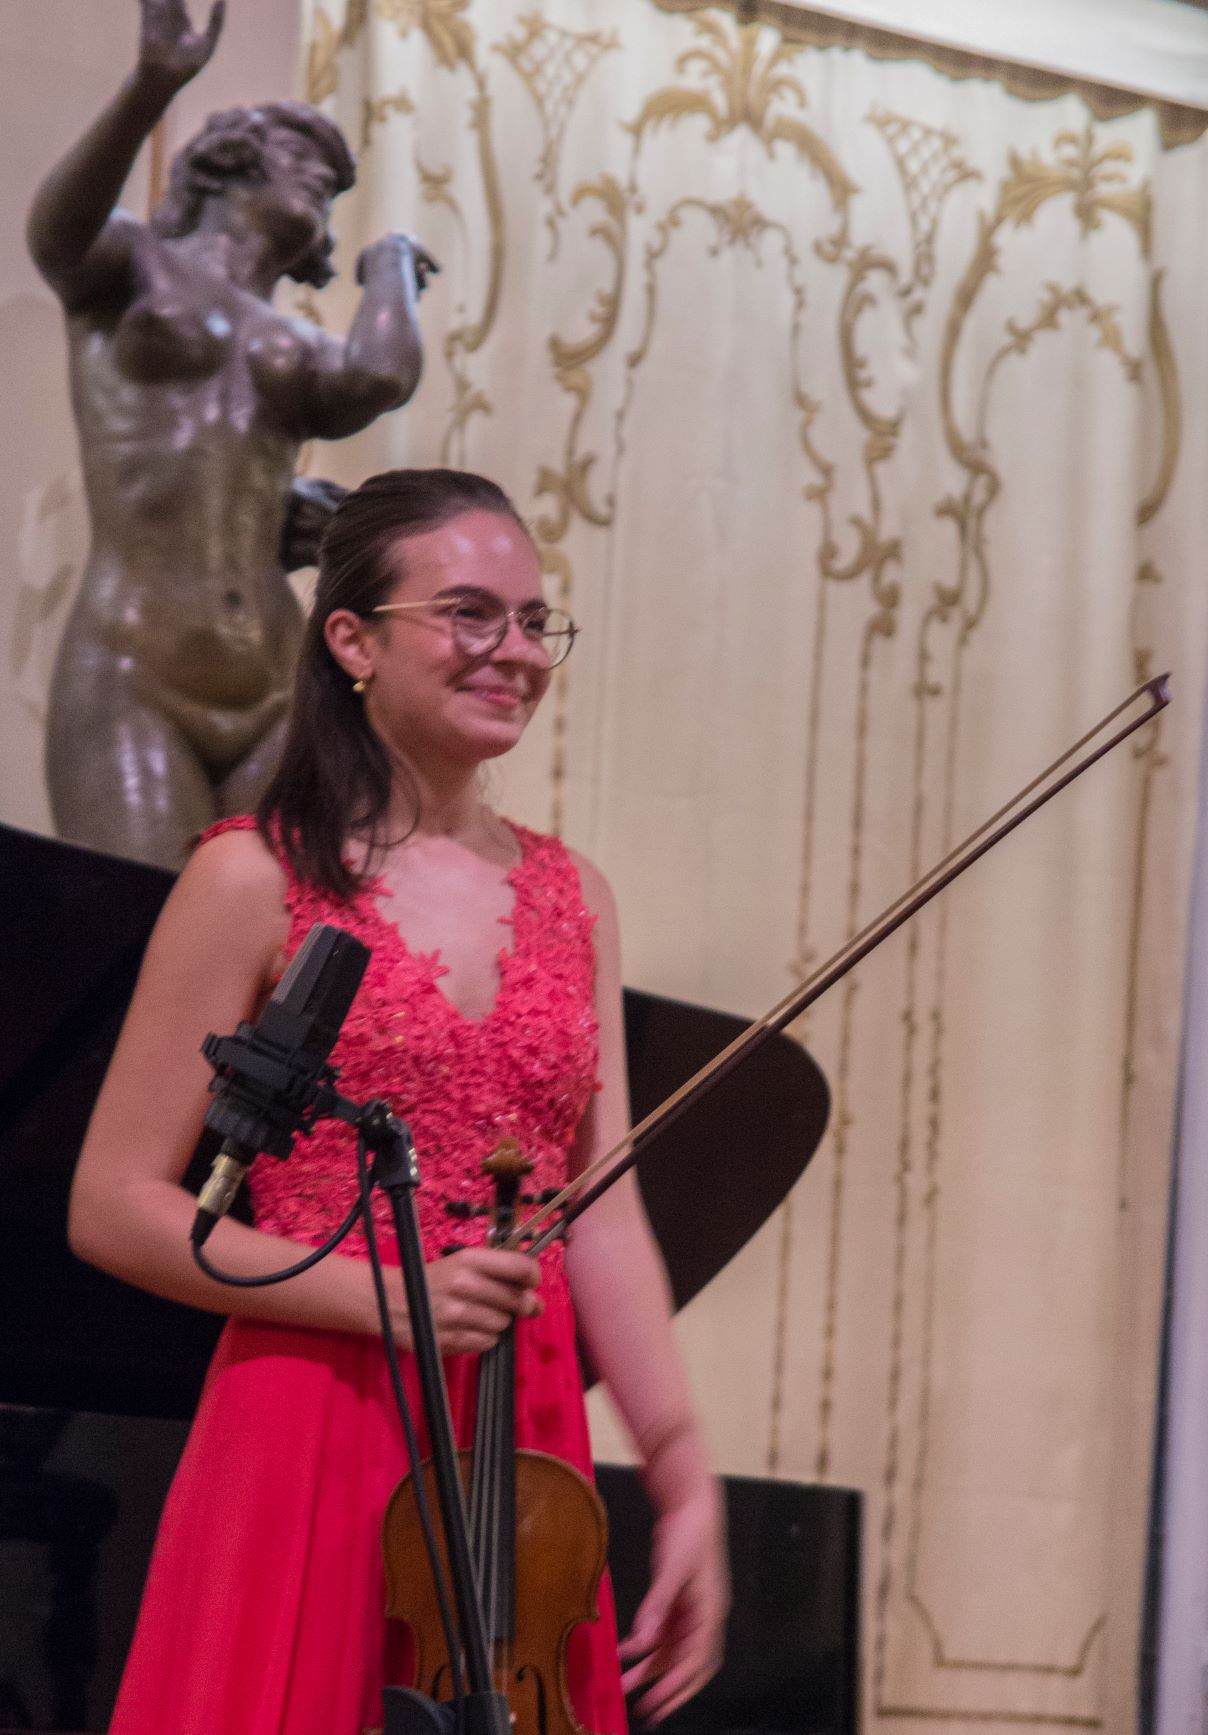 Borsista violino Chigiana 3